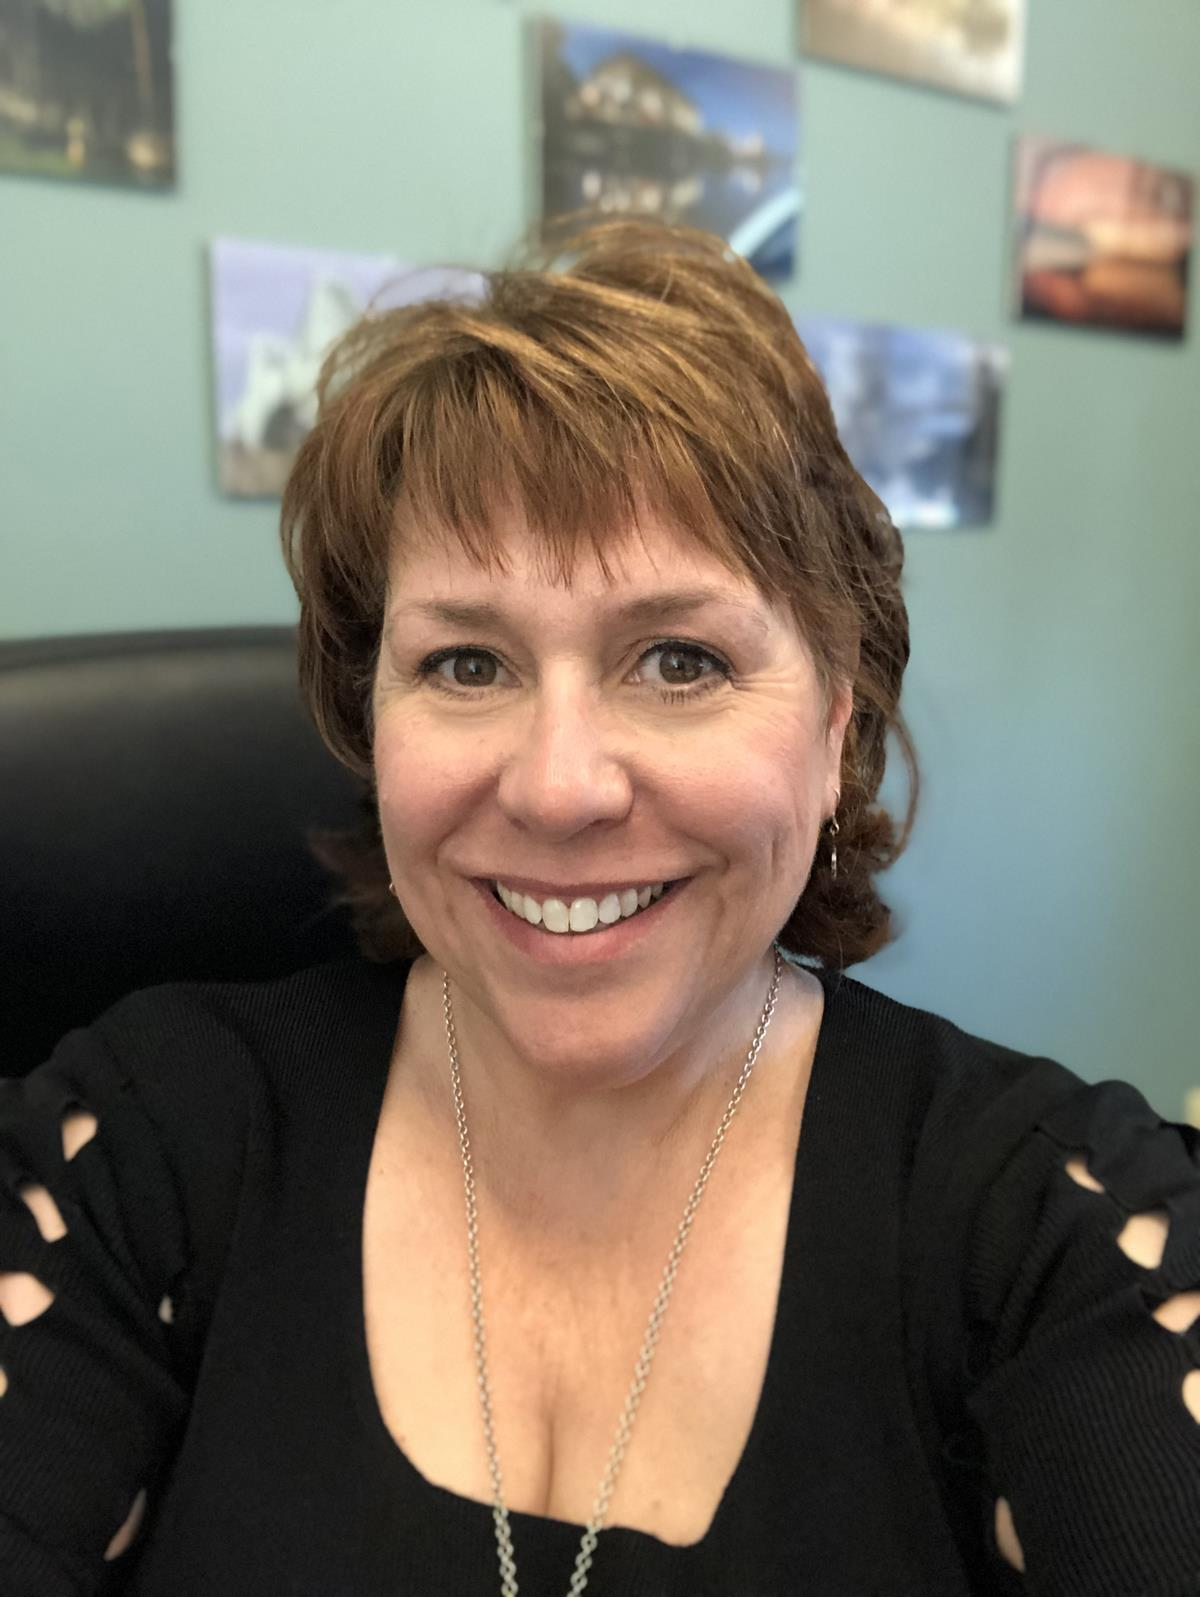 Janice Headshot